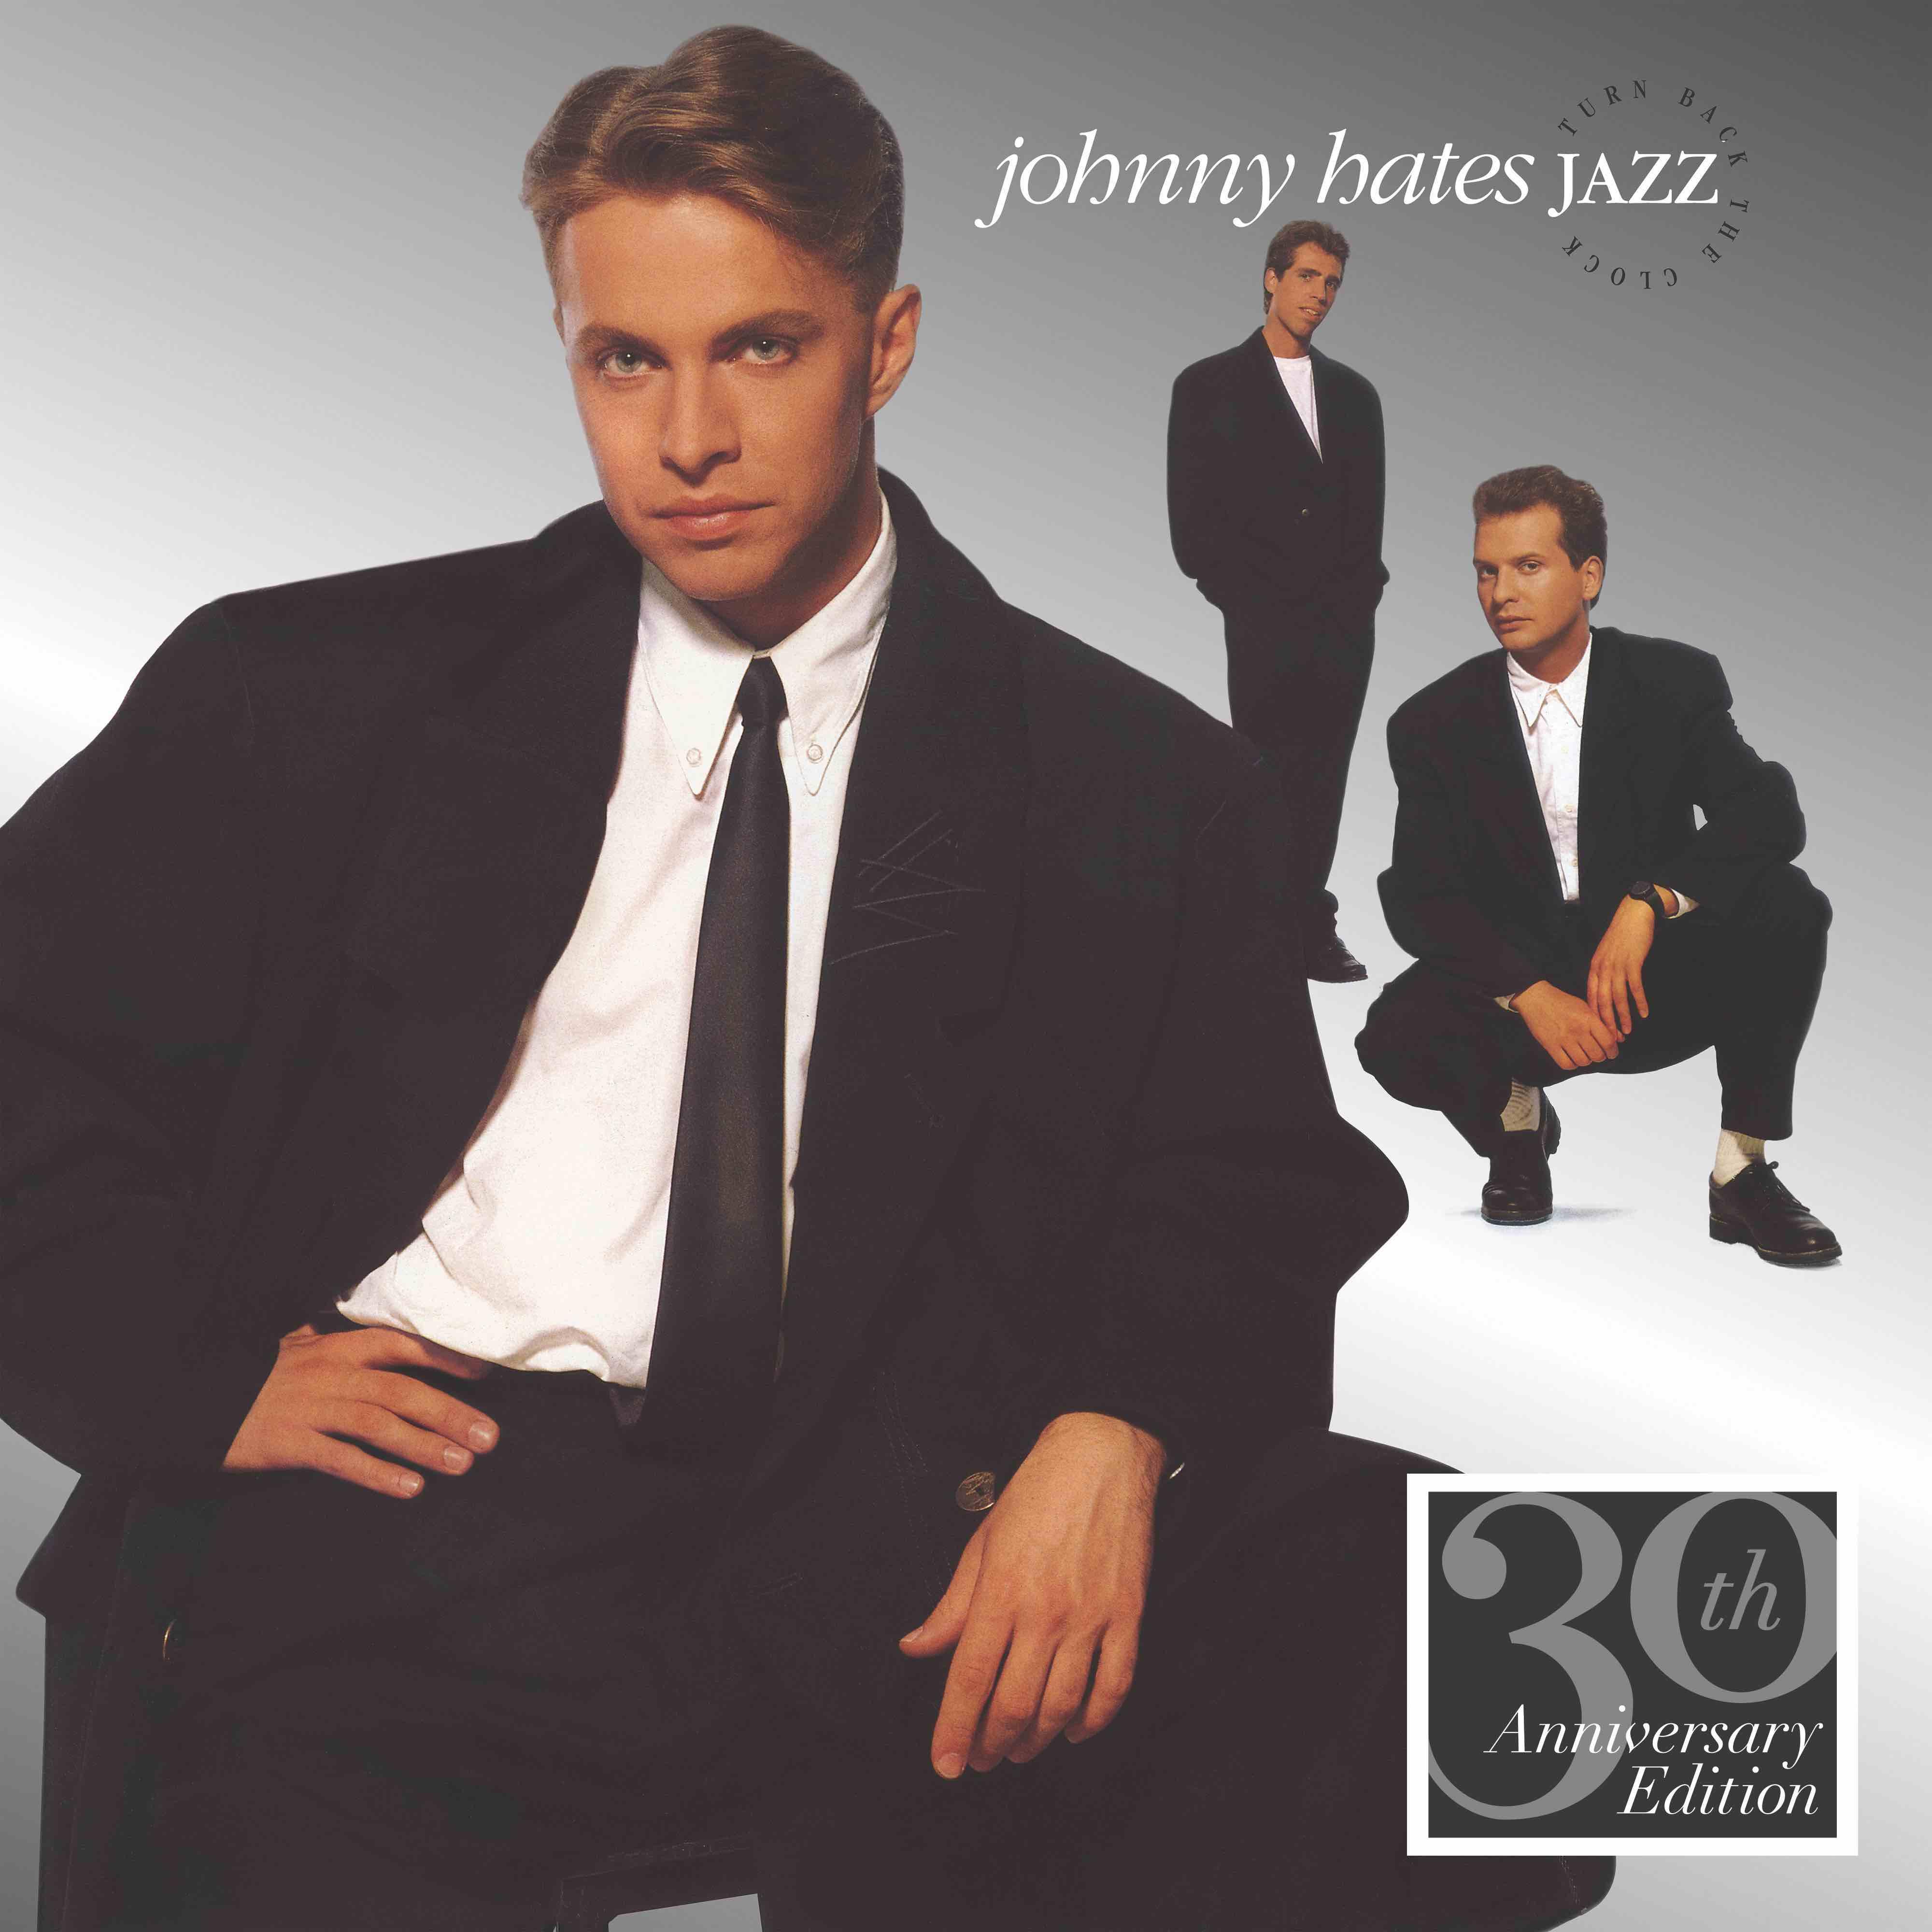 Johnny Hates Jazz: Turn Back The Clock - Music on Google Play